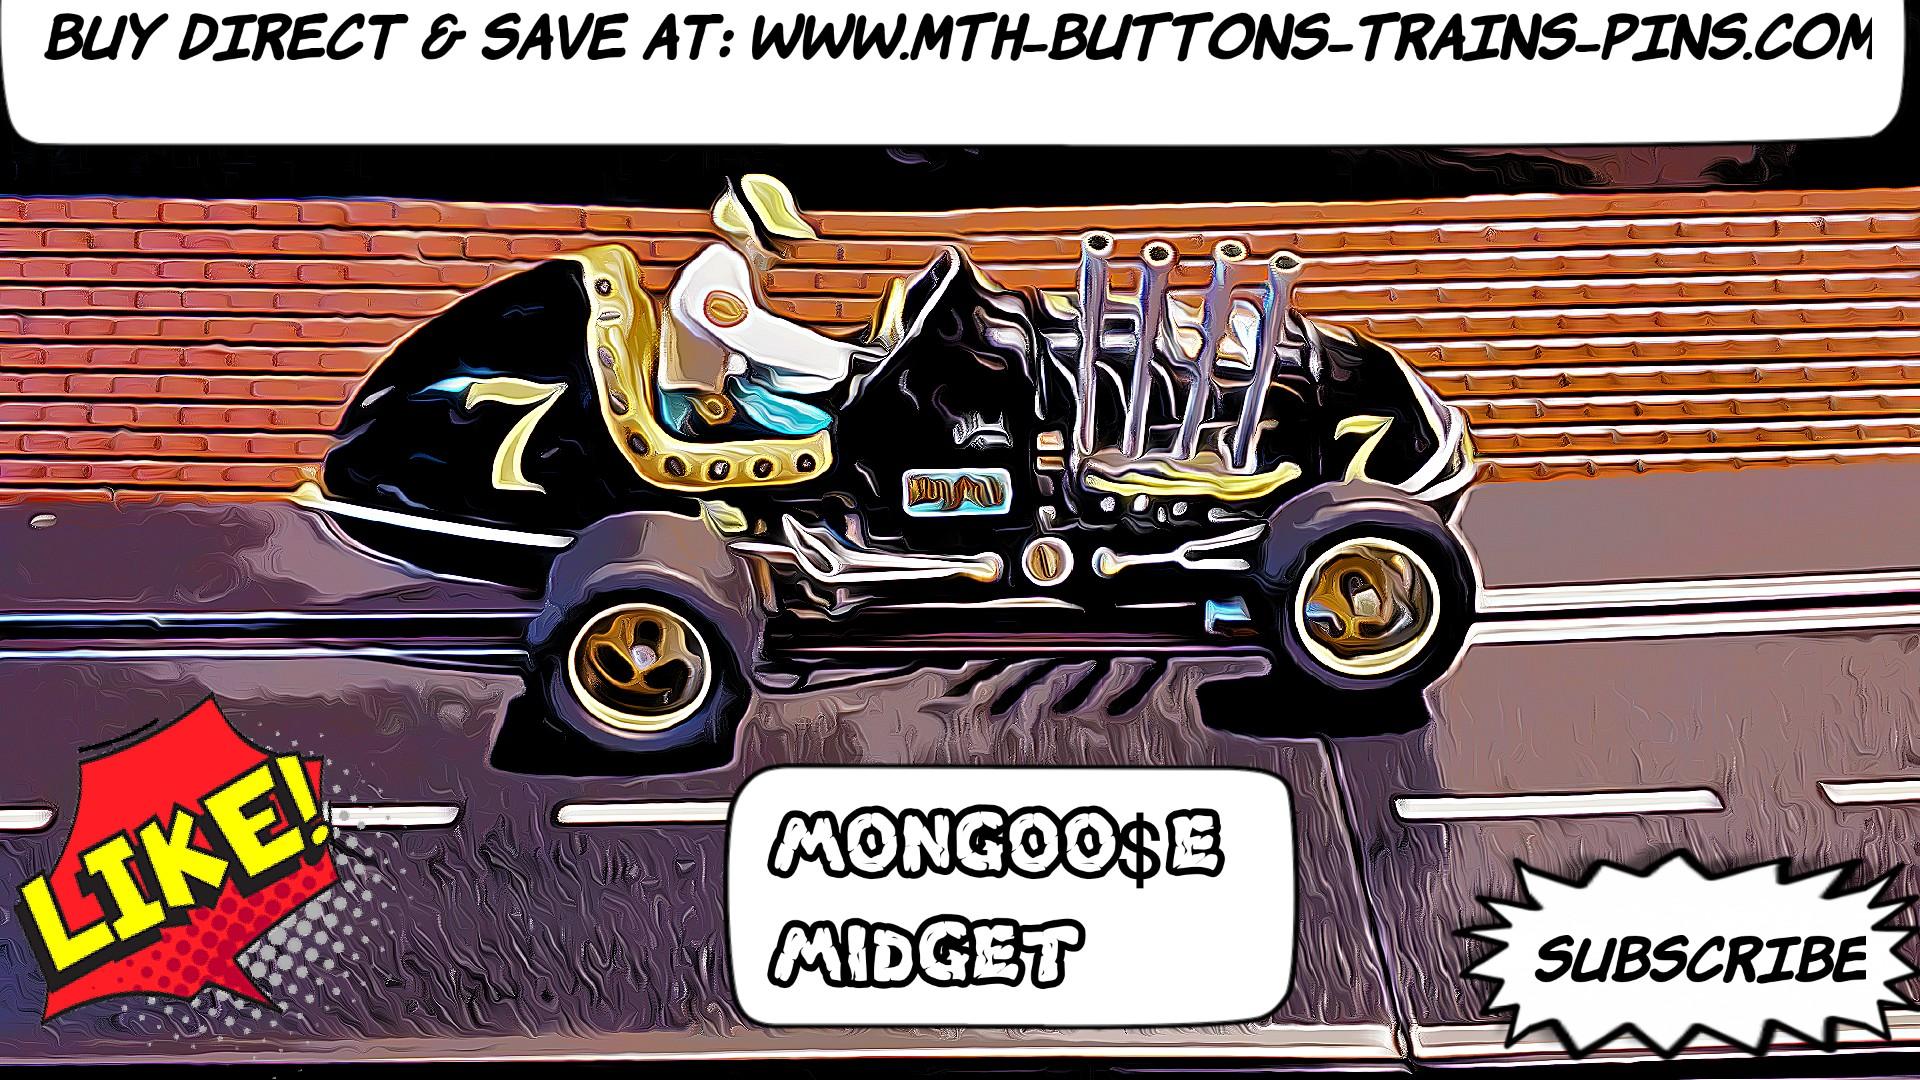 SALE *Save $100 vs. my Ebay Store Price* Monogram 1964 Midget Racer Mongoose Dirt Track Sprint Car Racing Special Slot Car 1/24 Scale – Car #7